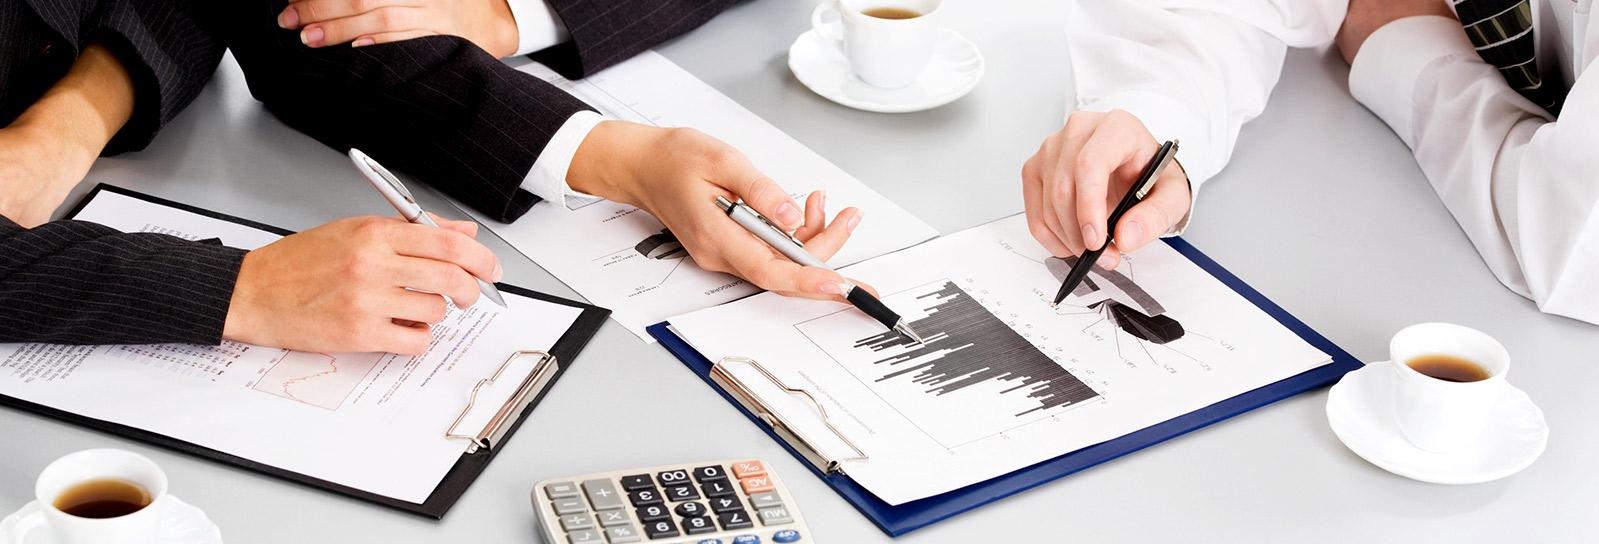 personal finance news